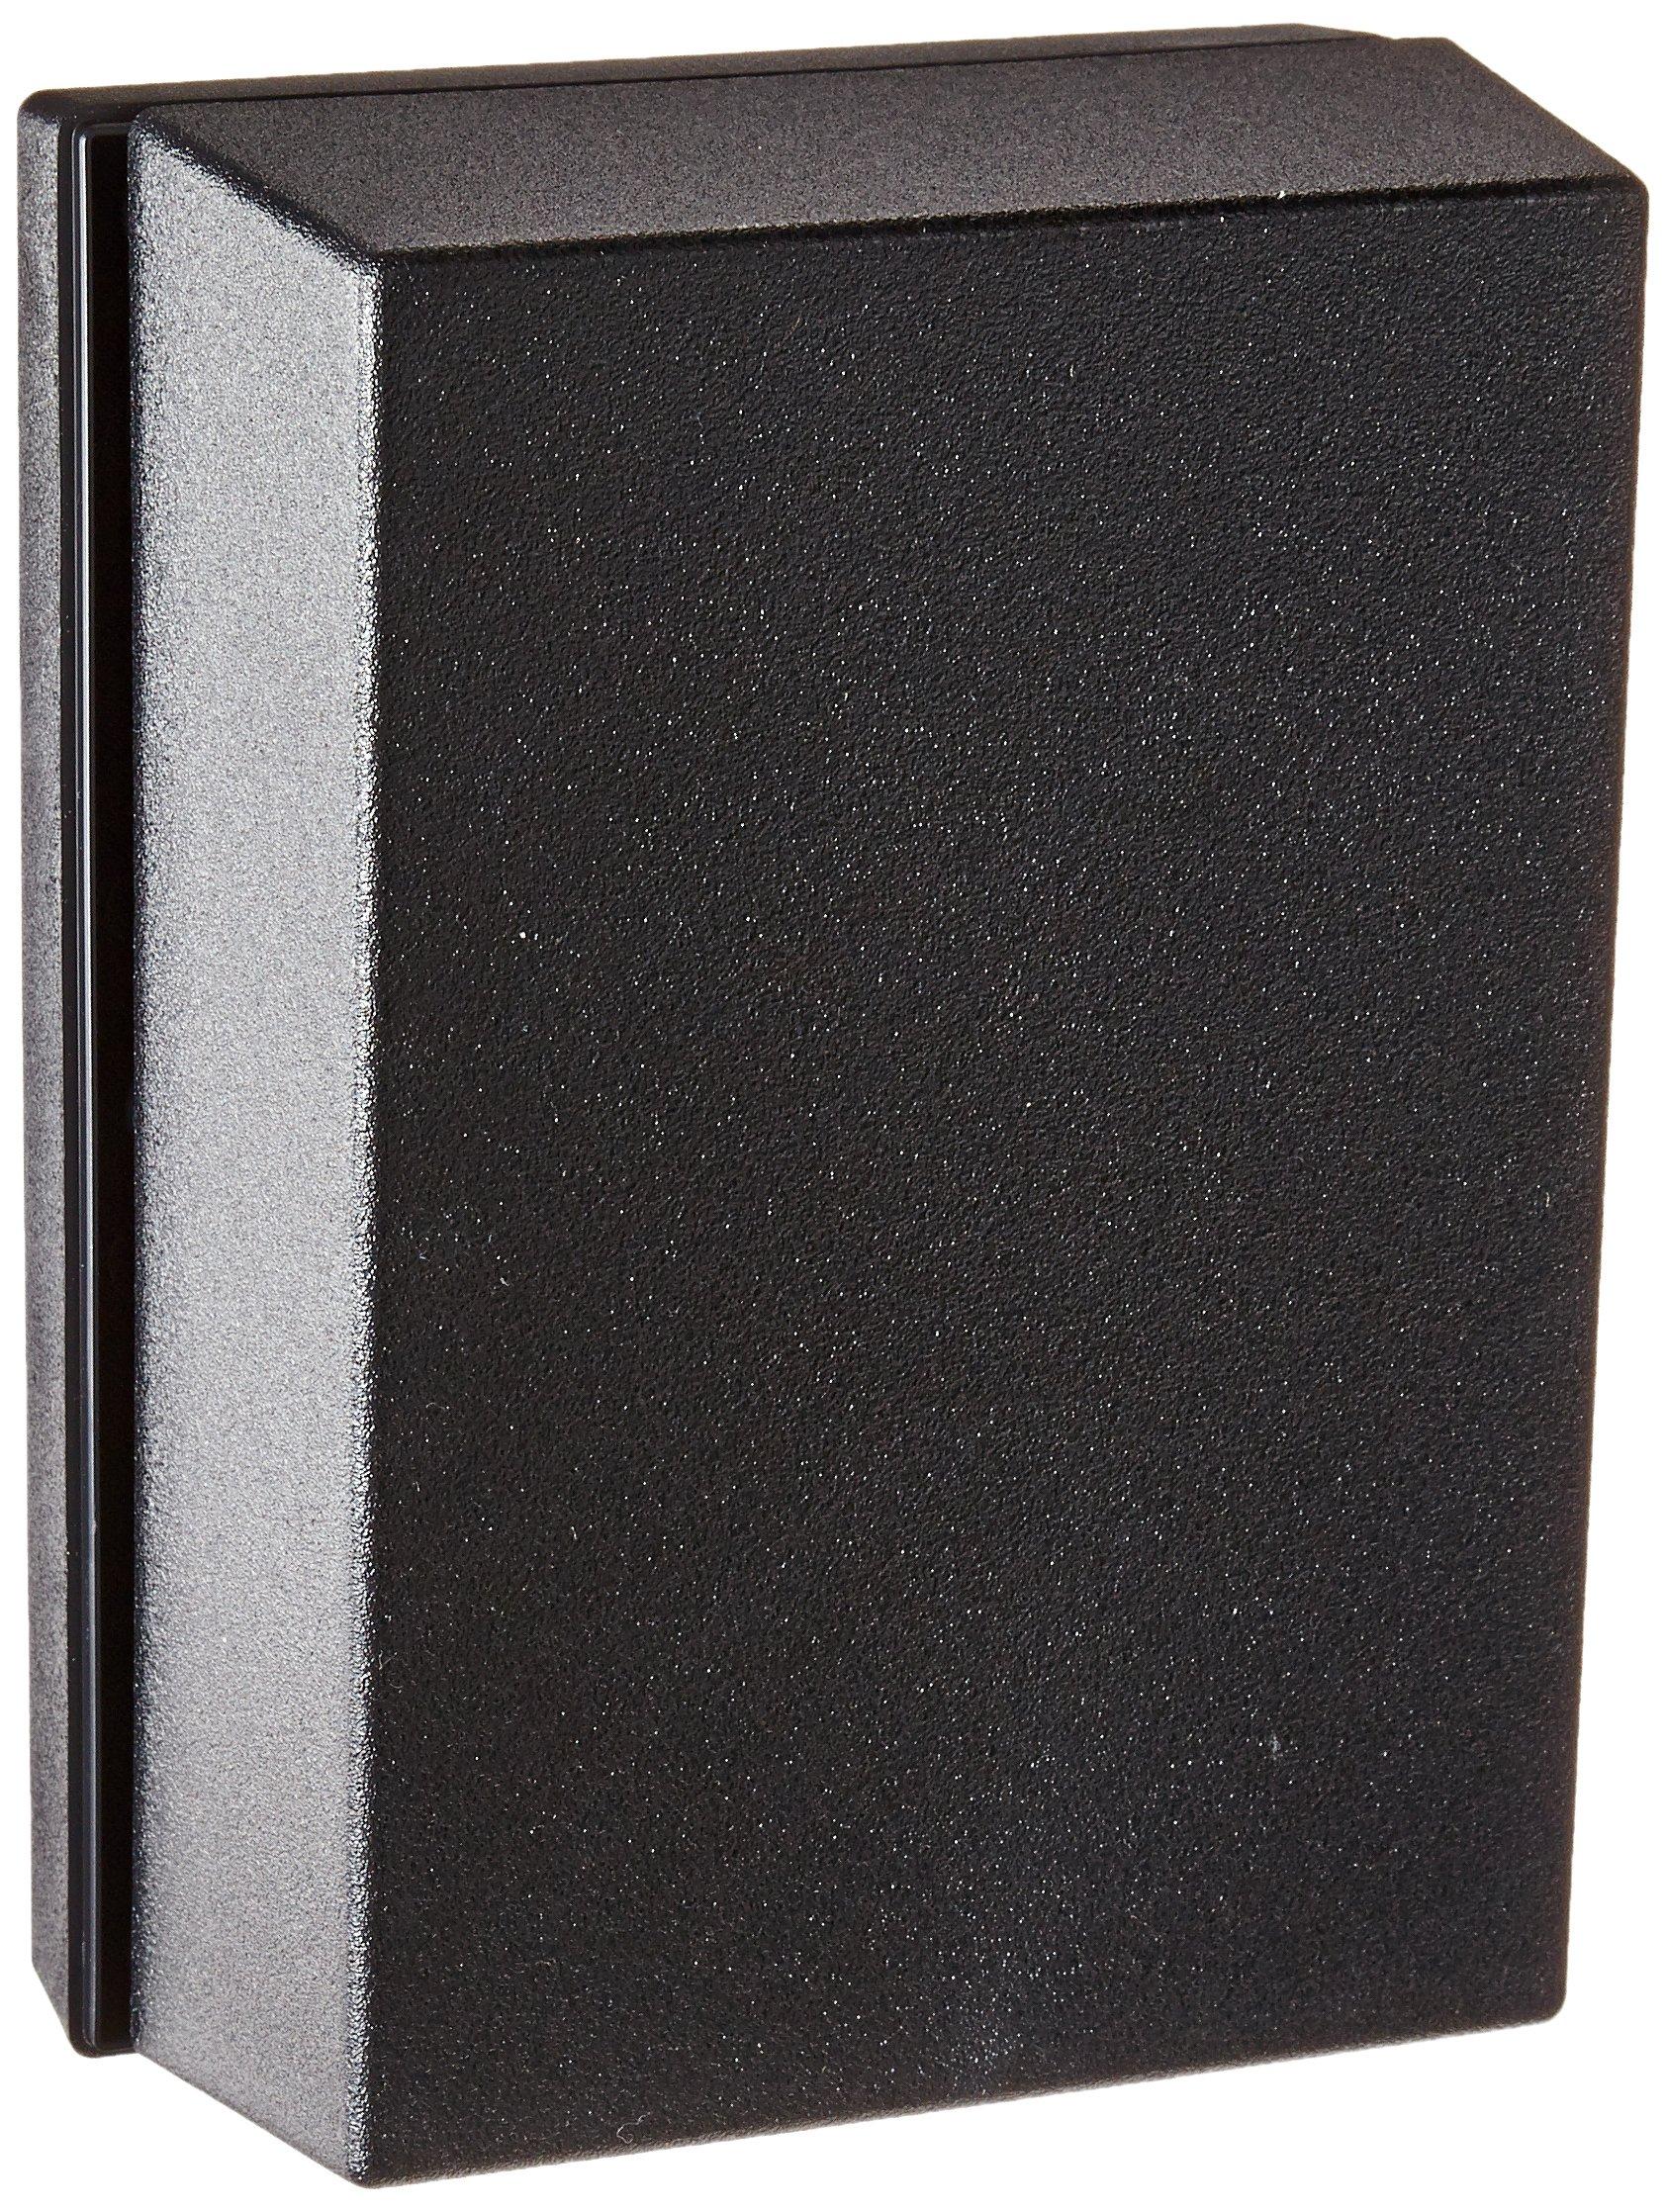 Serpac 173 ABS Plastic Enclosure, 6-7/8'' Length x 4-7/8'' Width x 2-1/2'' Height, Black